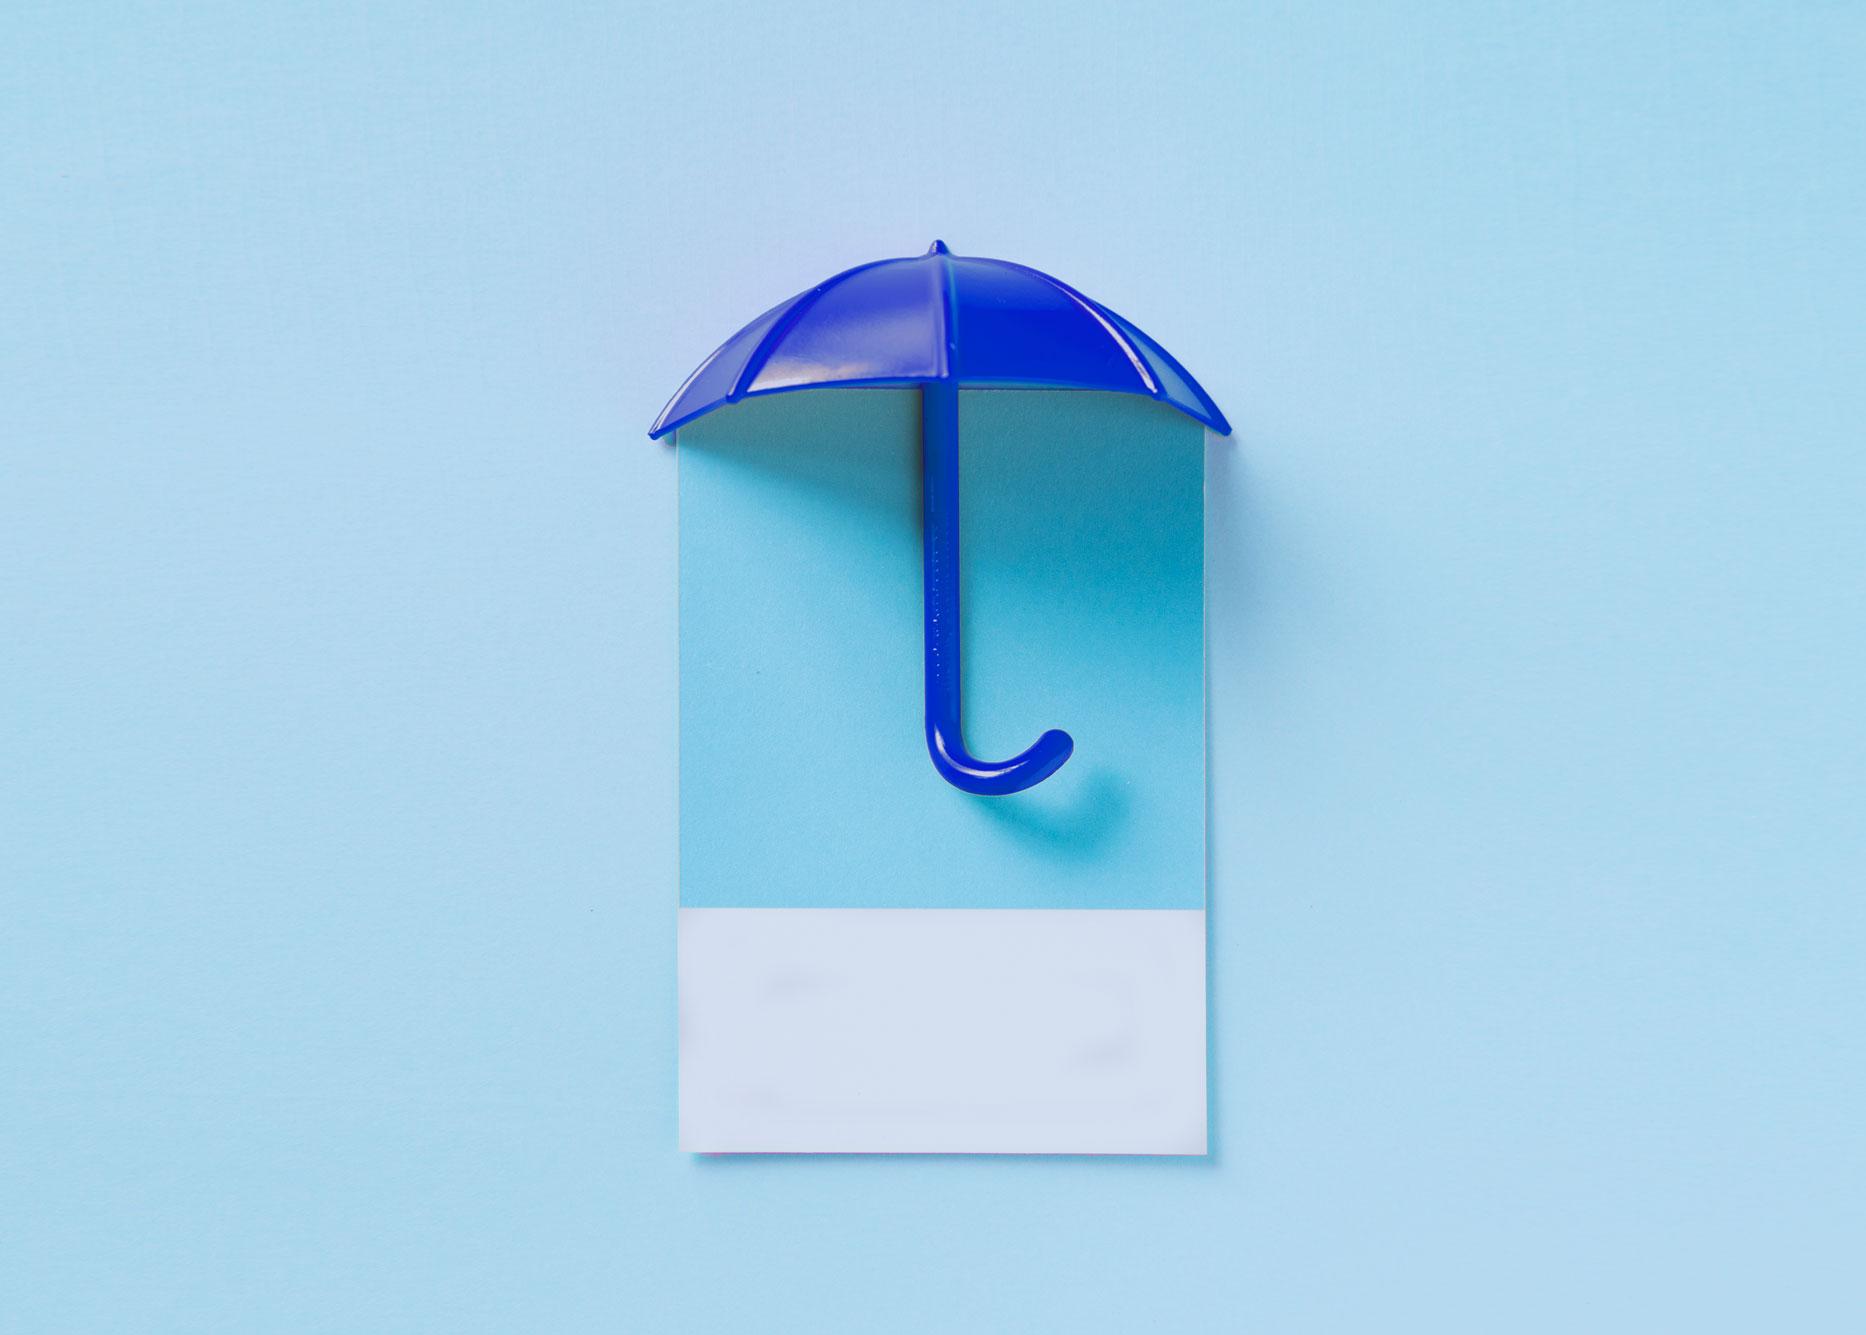 brandsafety-umbrella